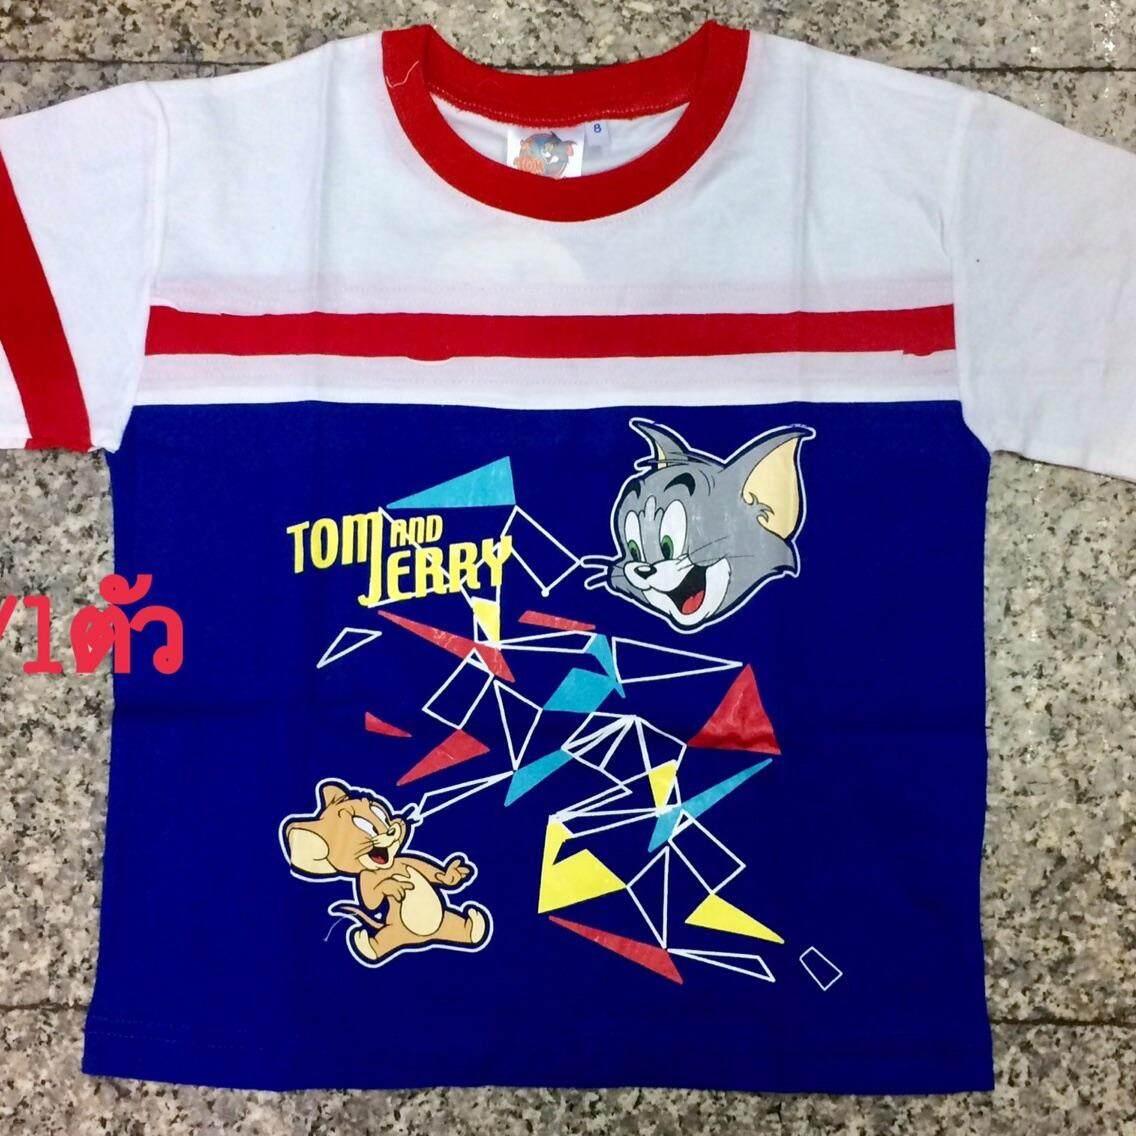 Tom & JERRY cotton t-shirt size 8